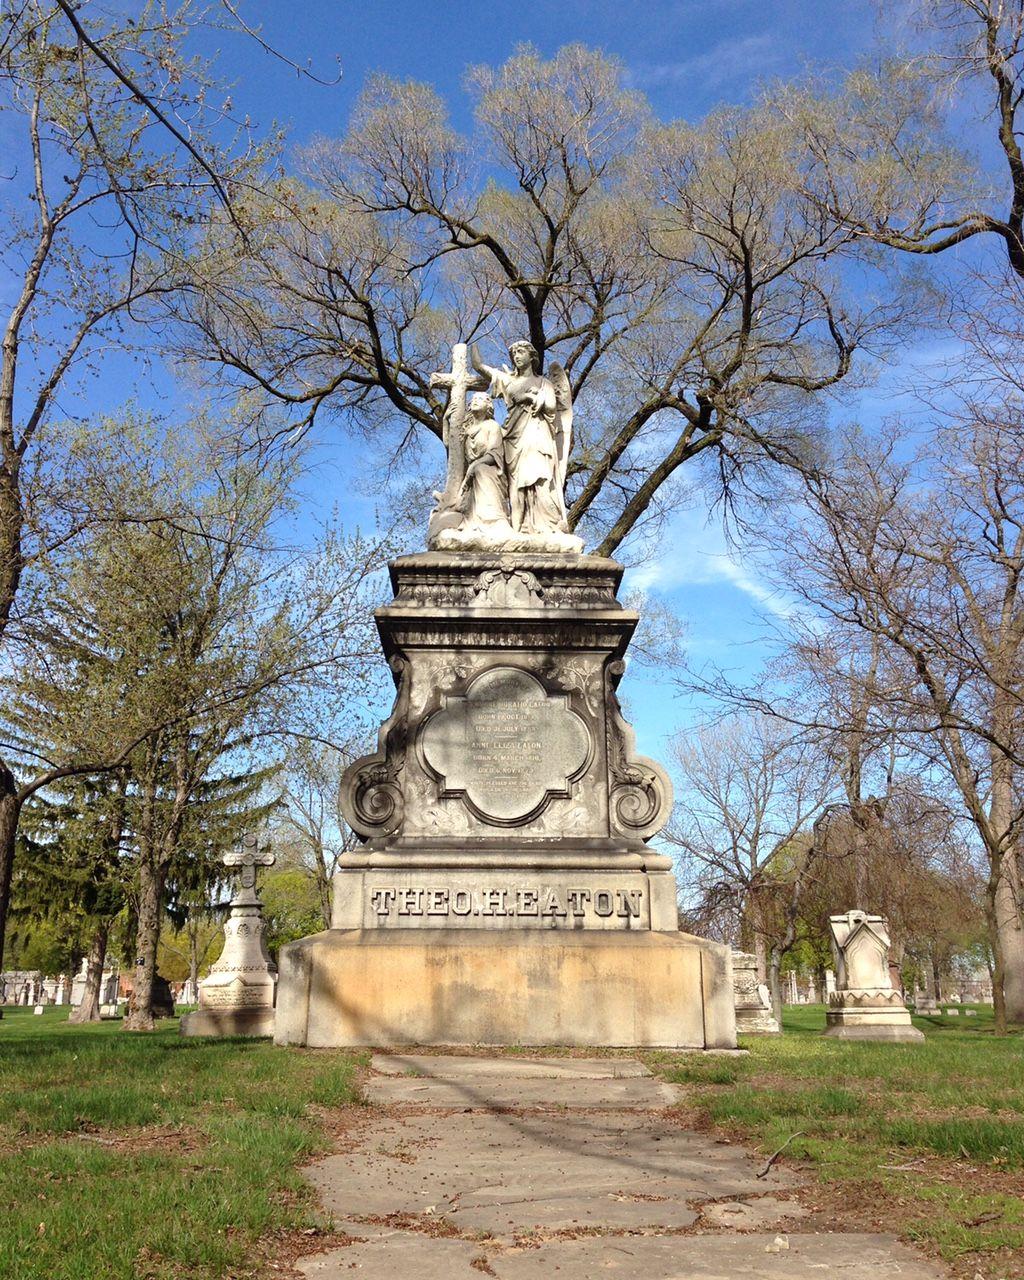 35a2ec5805ba19d7aceee30d6d047821 - Memorial Gardens Cemetery Traverse City Mi